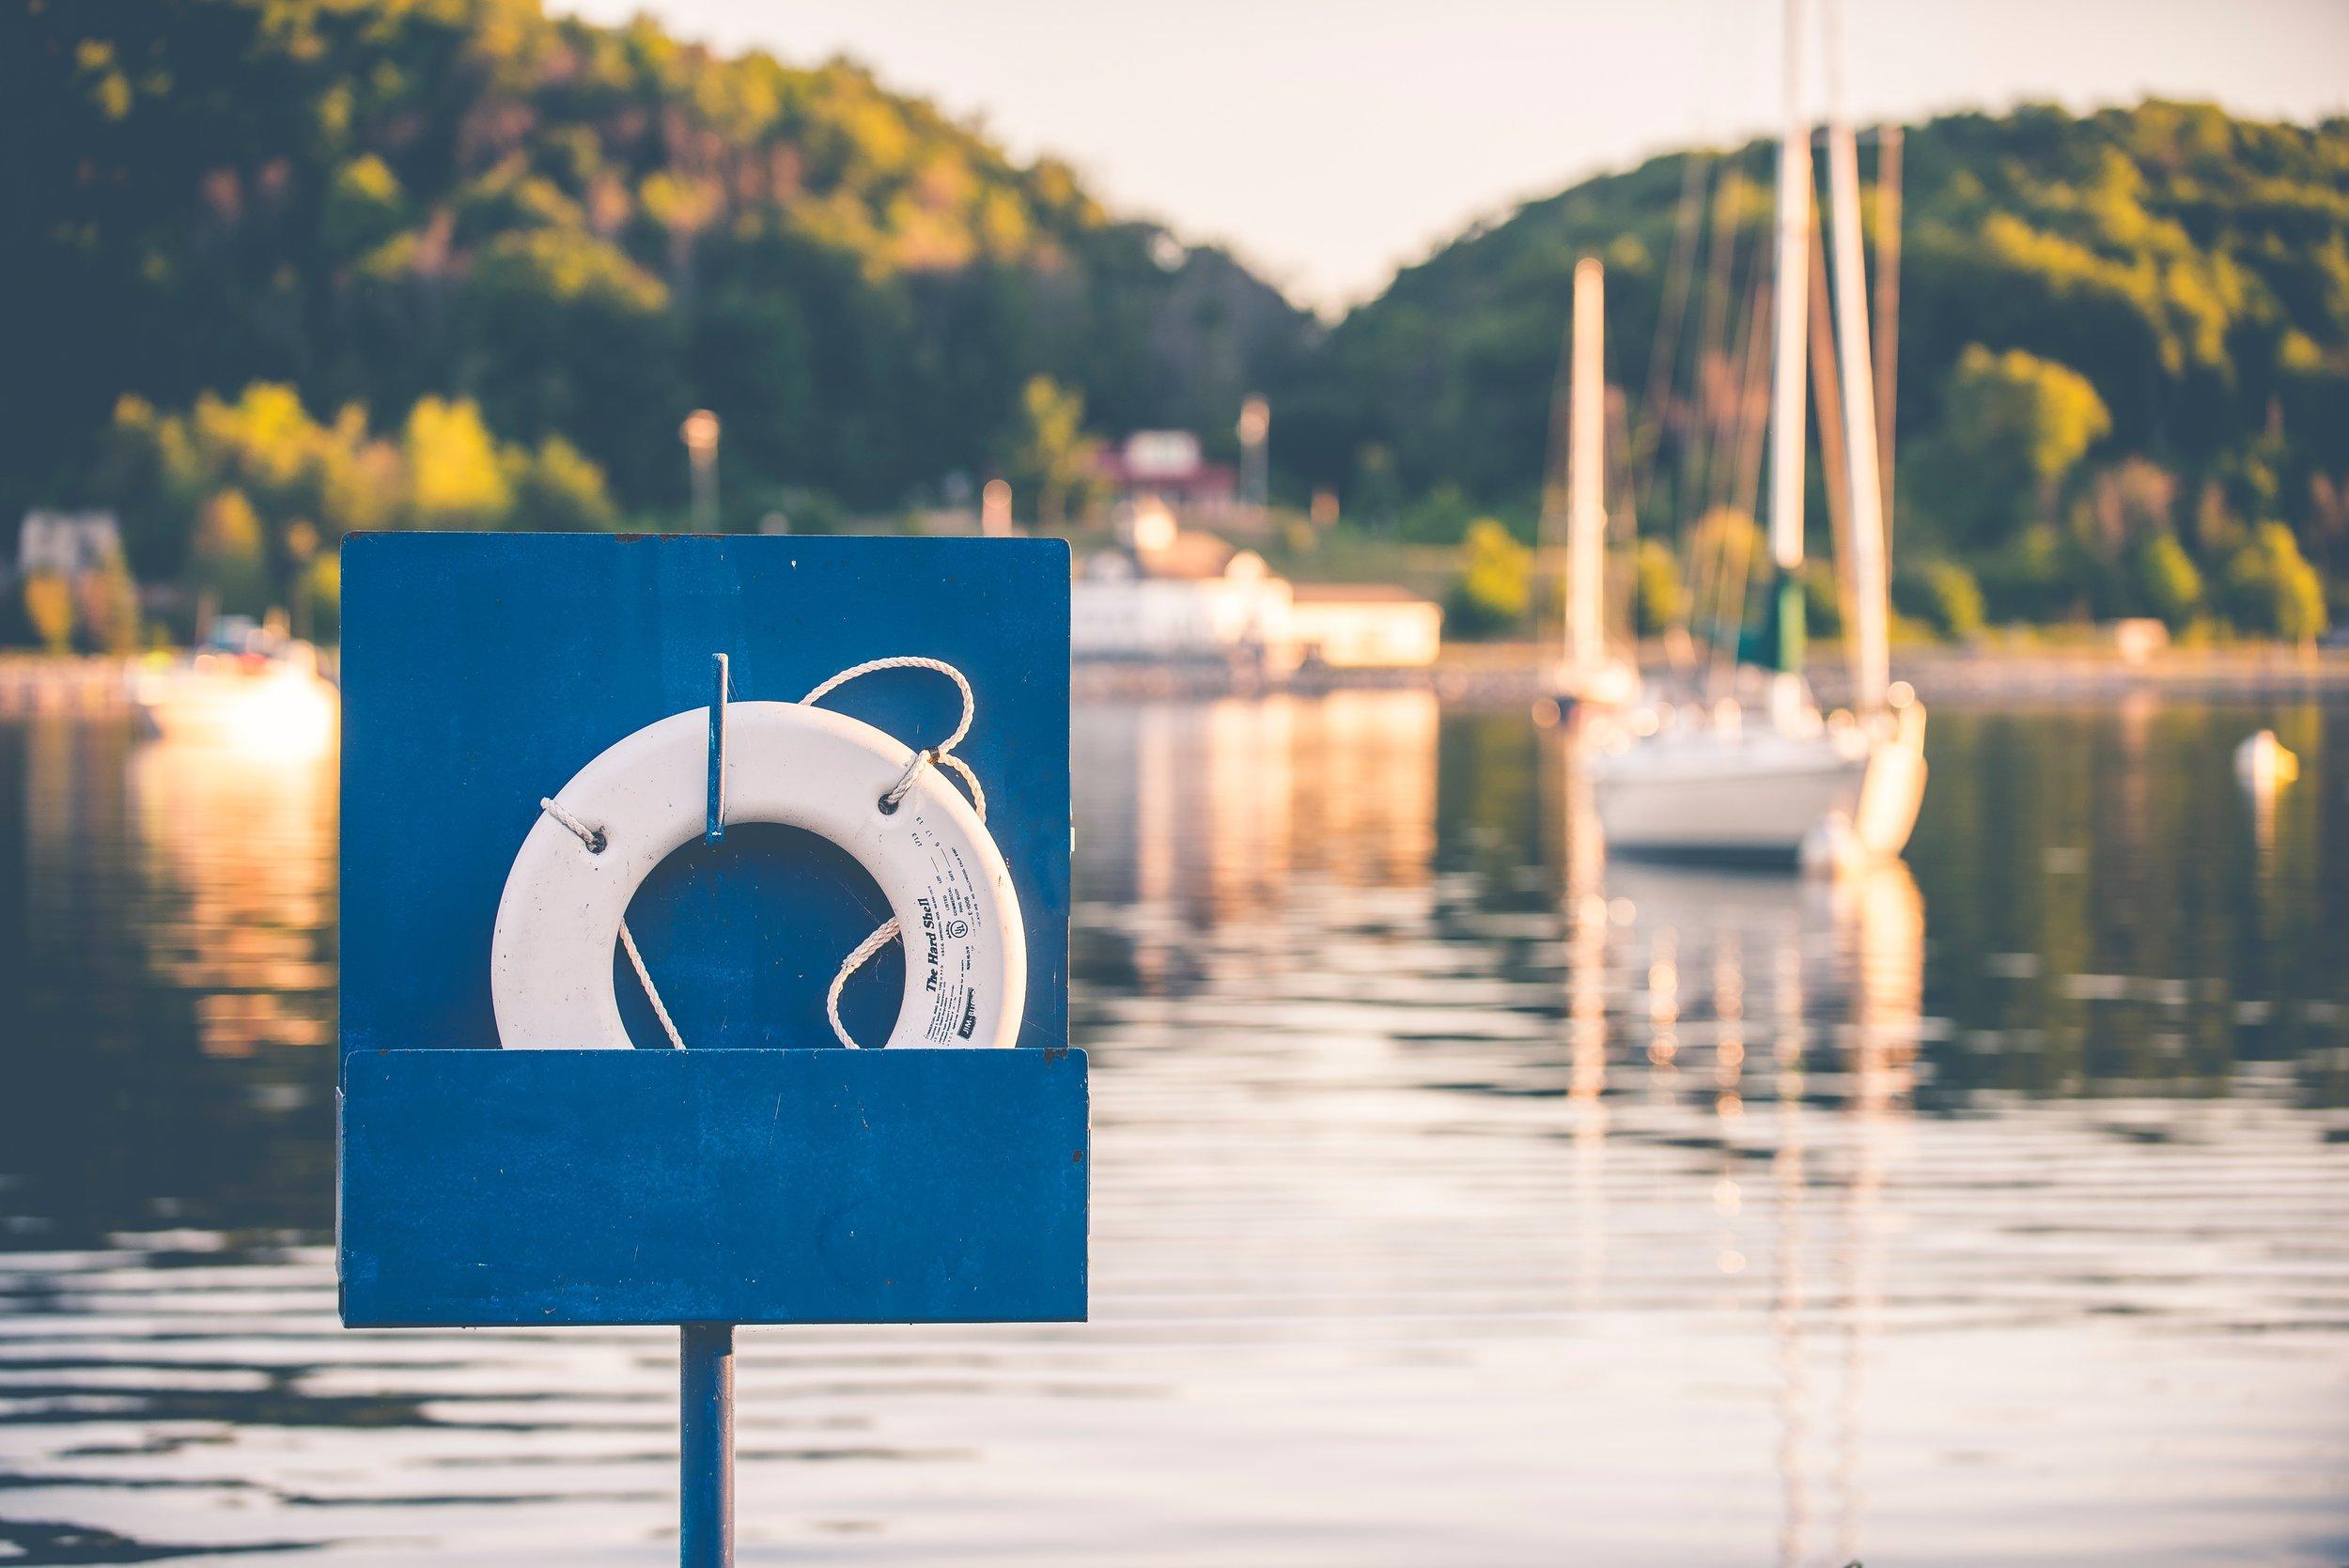 Lifesaver symbolic of business relationship drowning